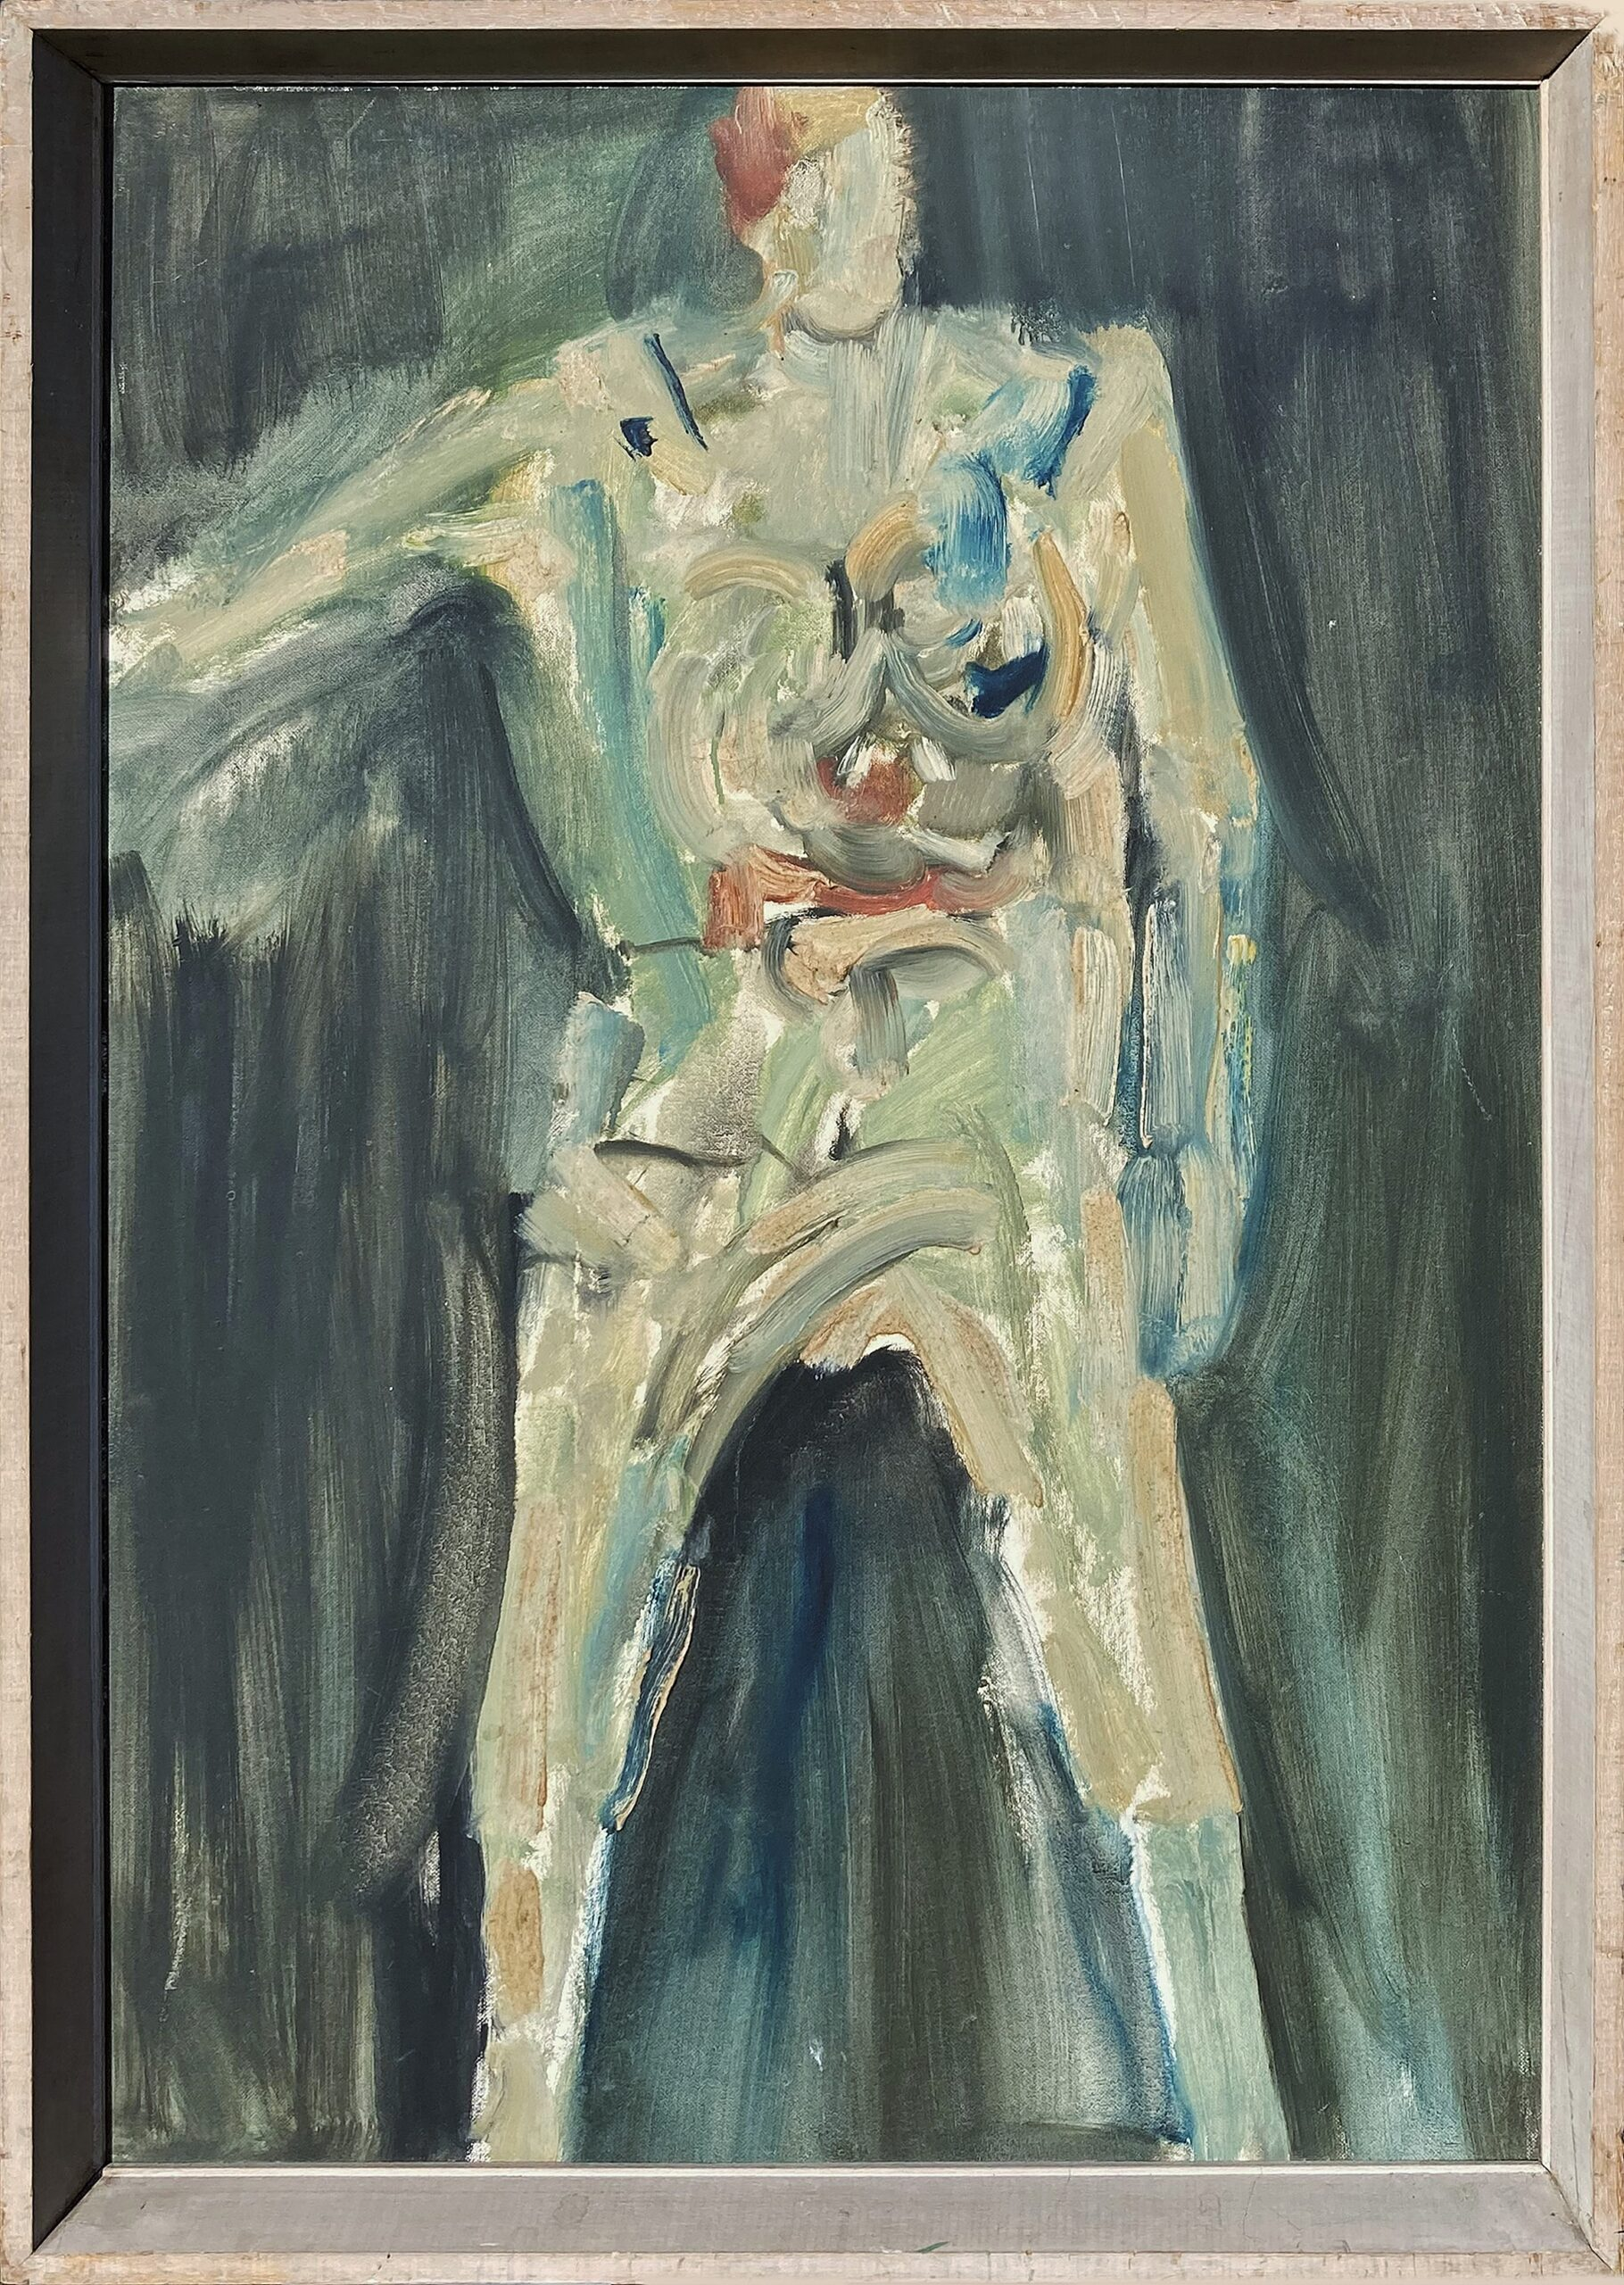 Clown, Bob Crossley, 1961, Castlegate House Gallery